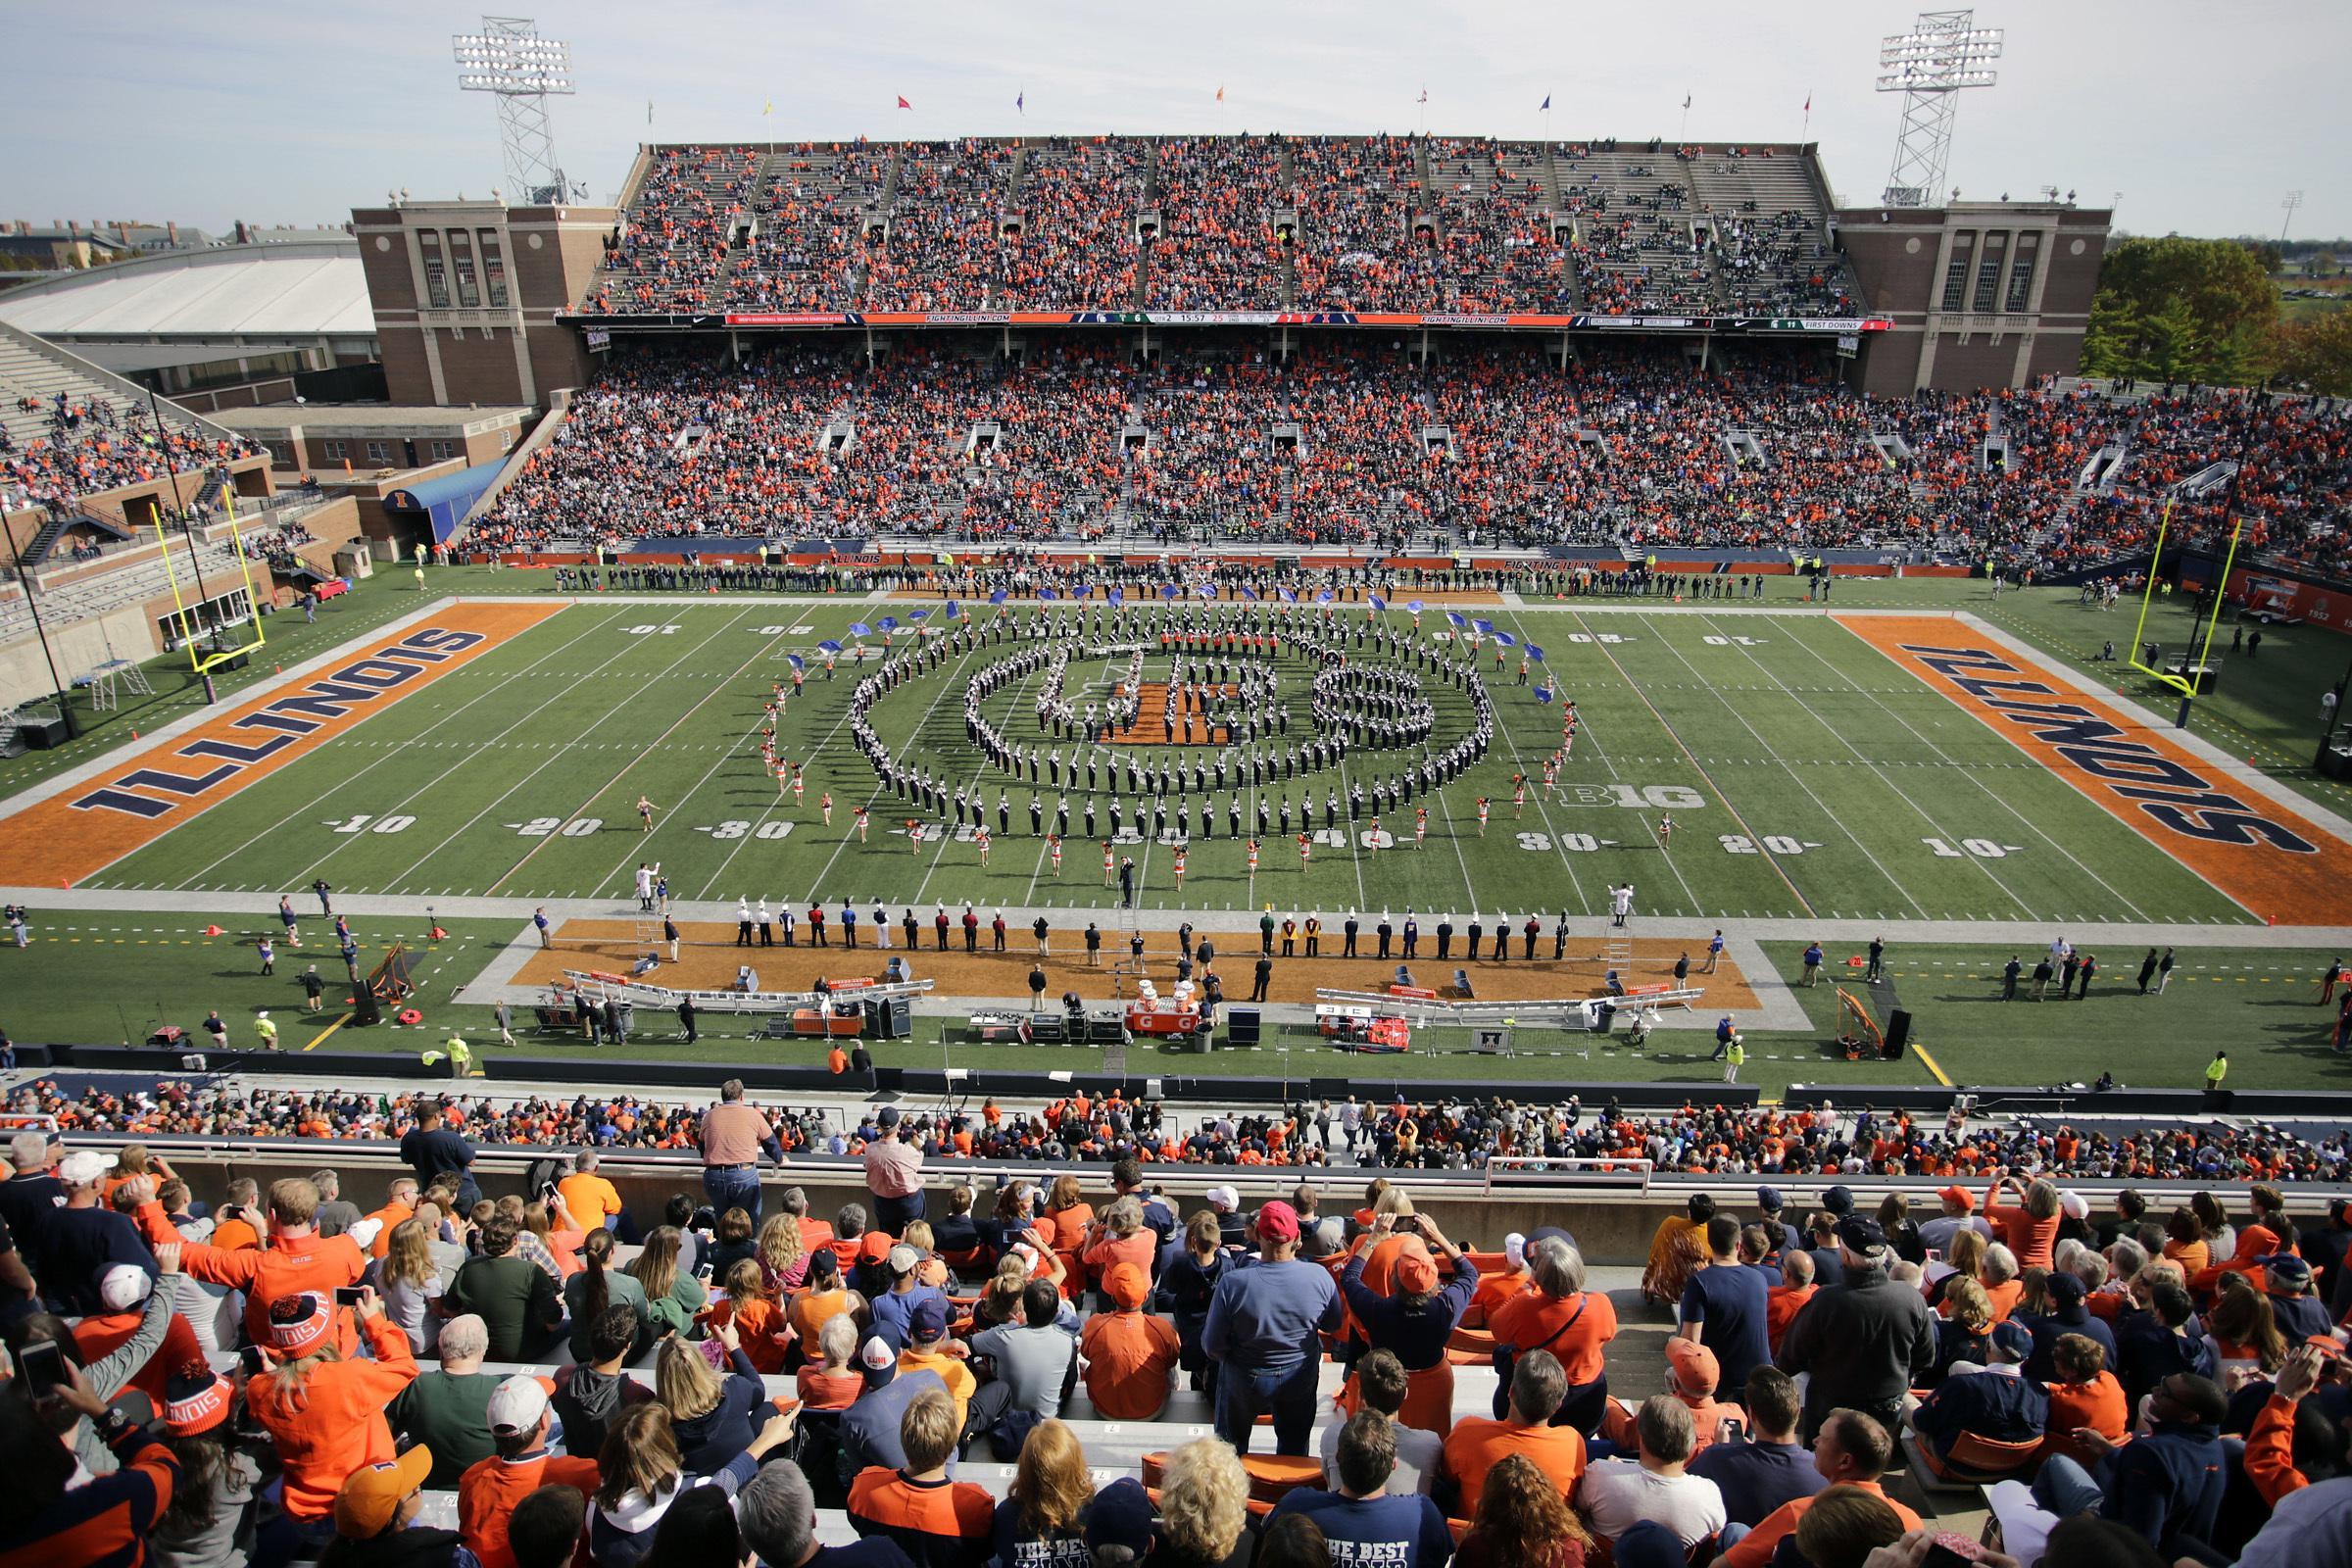 University Of Illinois At Urbana-Champaign Calendar 2020 Finally: ISU Football To Play Illini In 2020 | WGLT